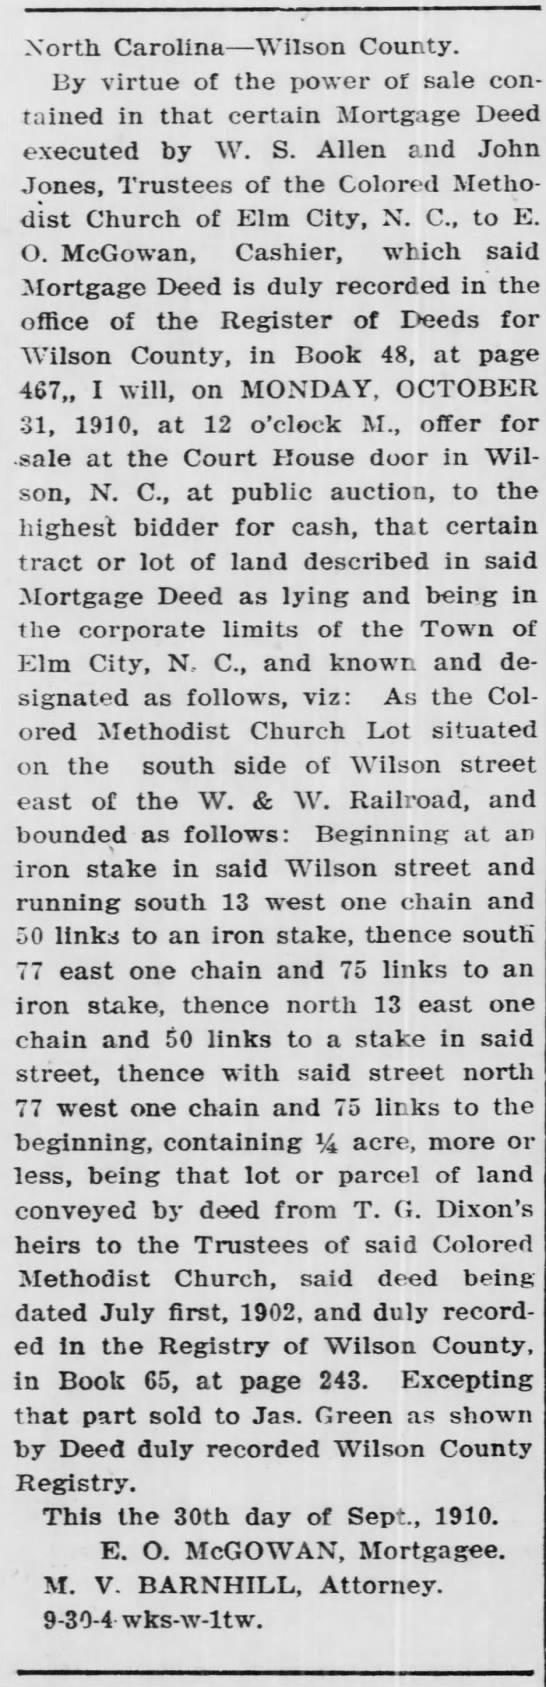 WDT 11 15 1910